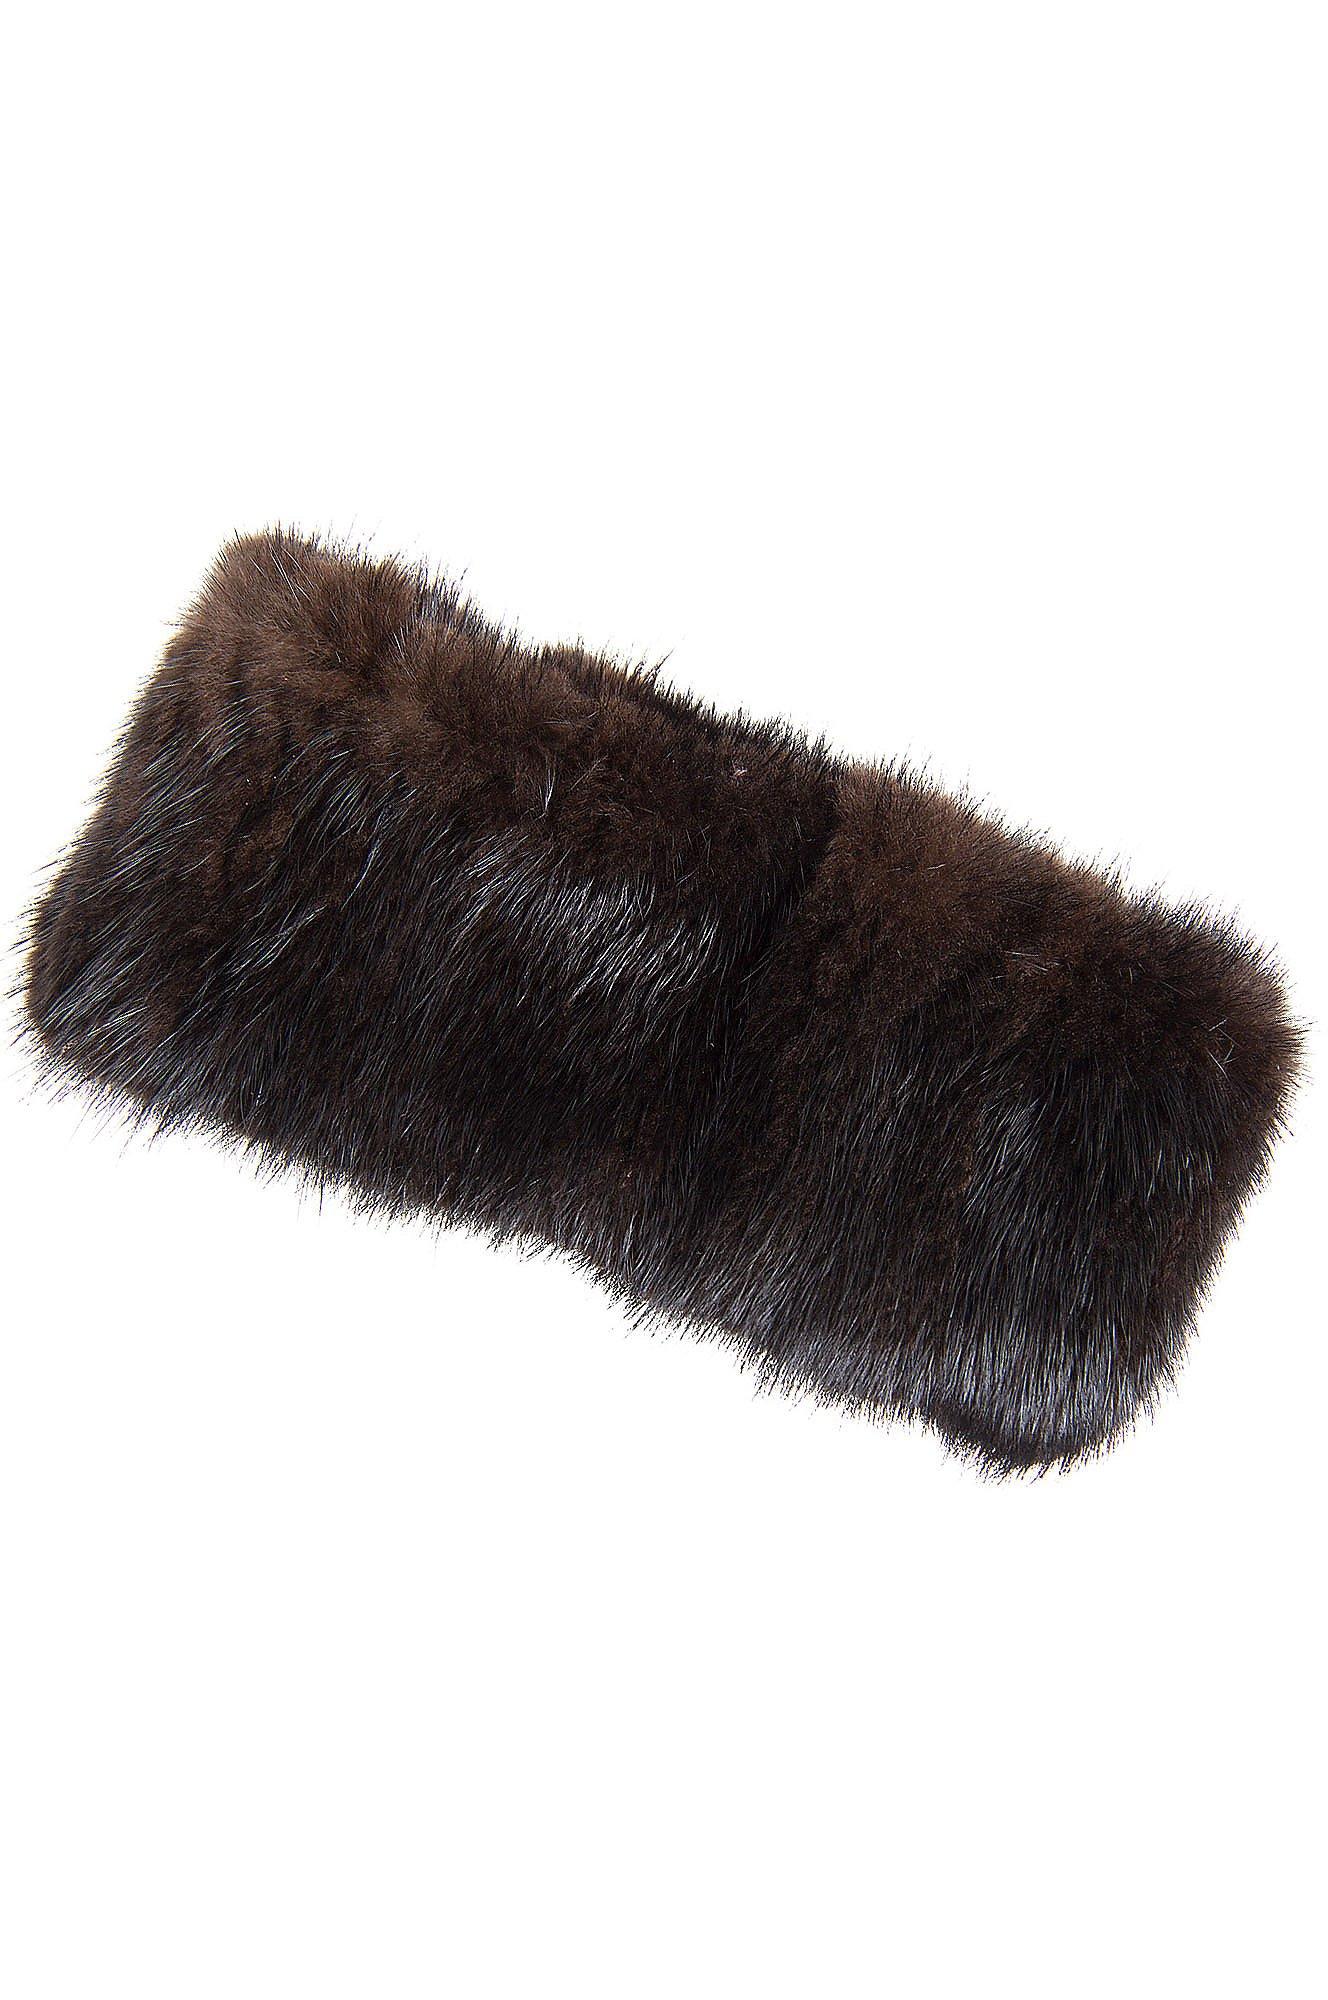 Knitted Finn Mink Fur Headband by Overland Sheepskin Co